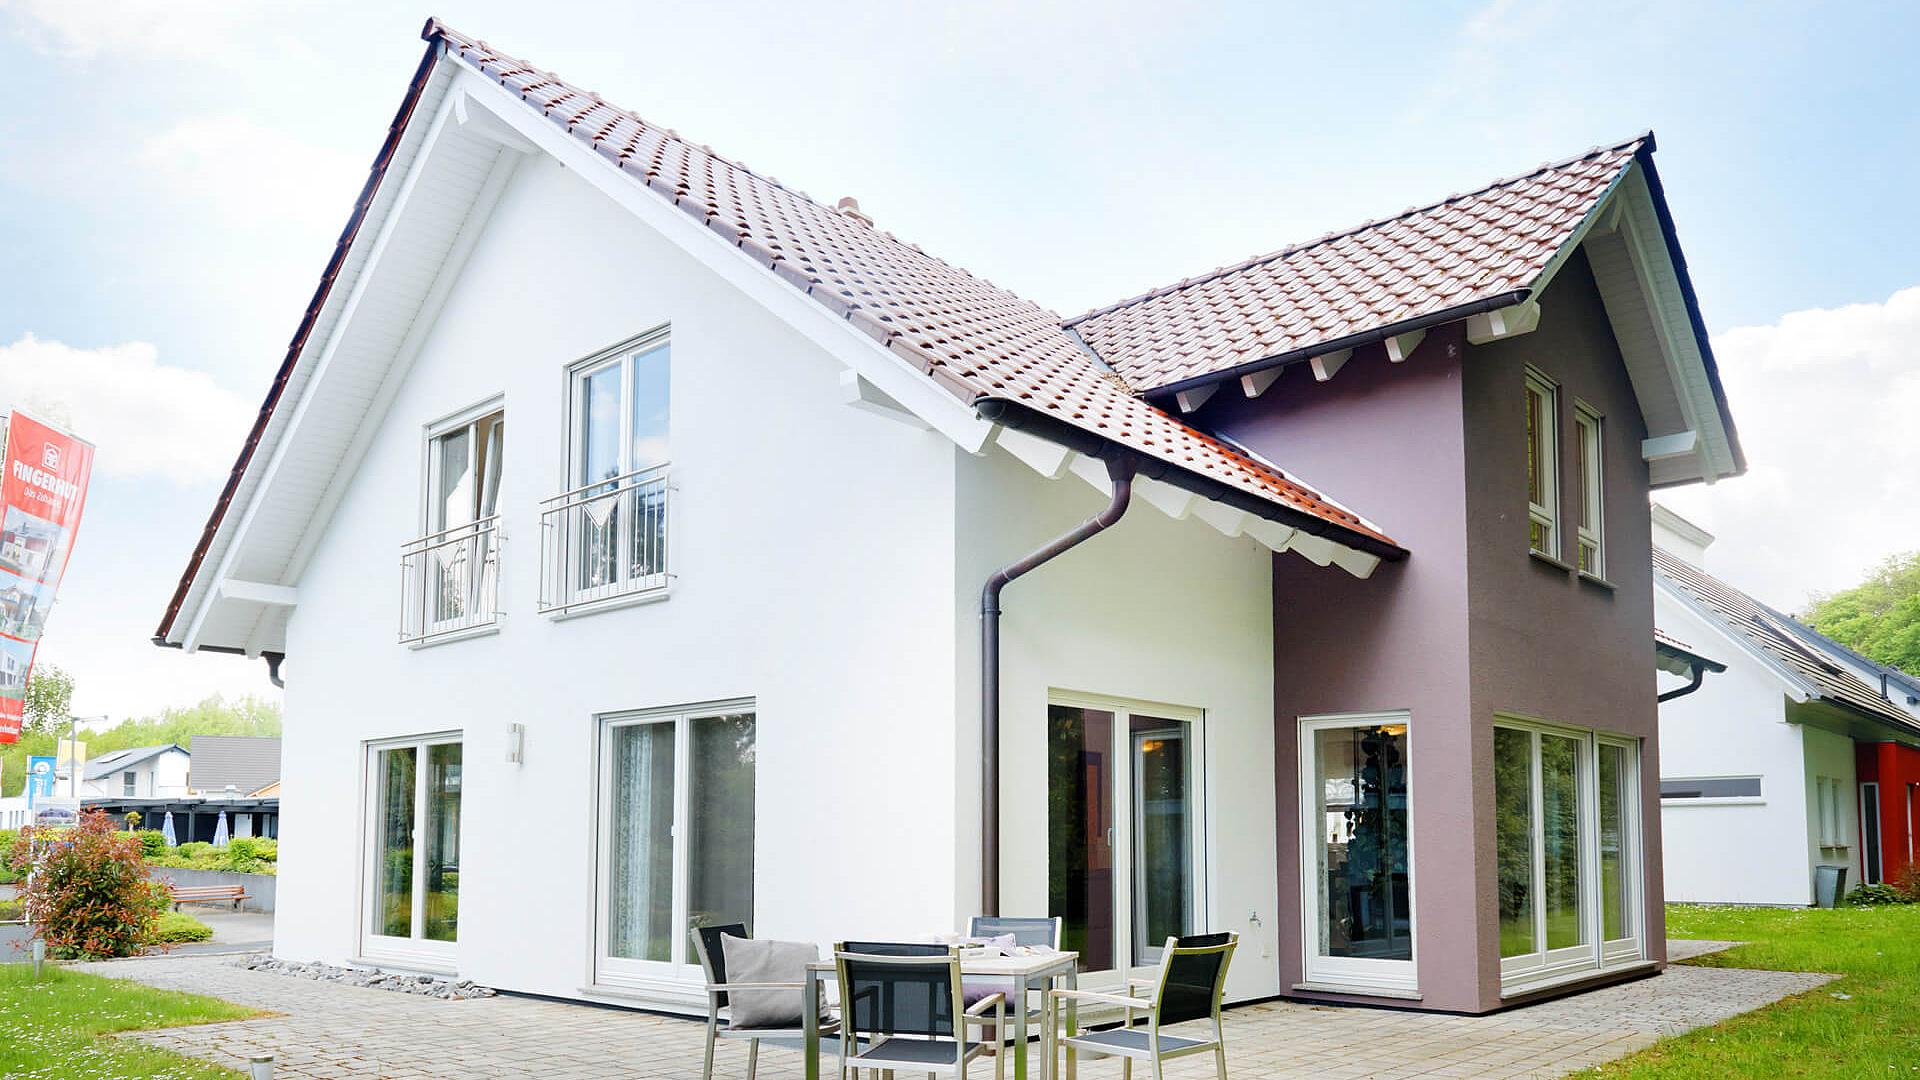 Musterhaus in Bad Vilbel | Fertighäuser von FINGERHUT